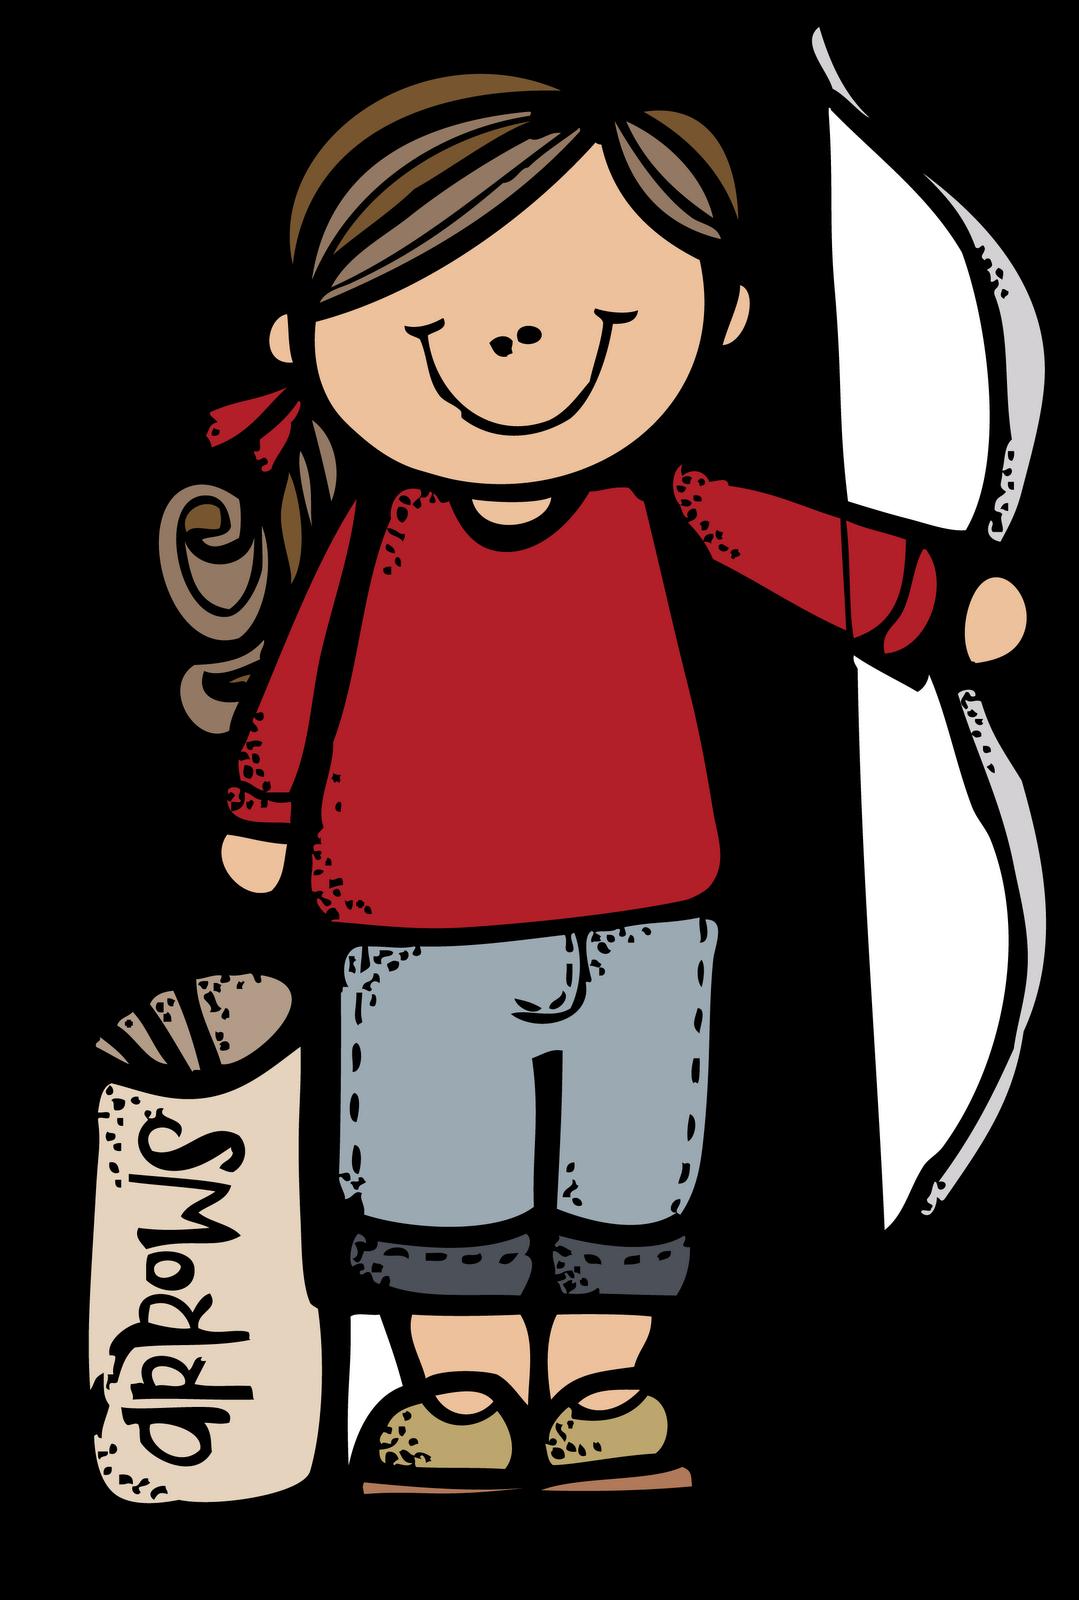 1079x1600 Melonheadz Lds Illustrating Girls Camp Illustrations